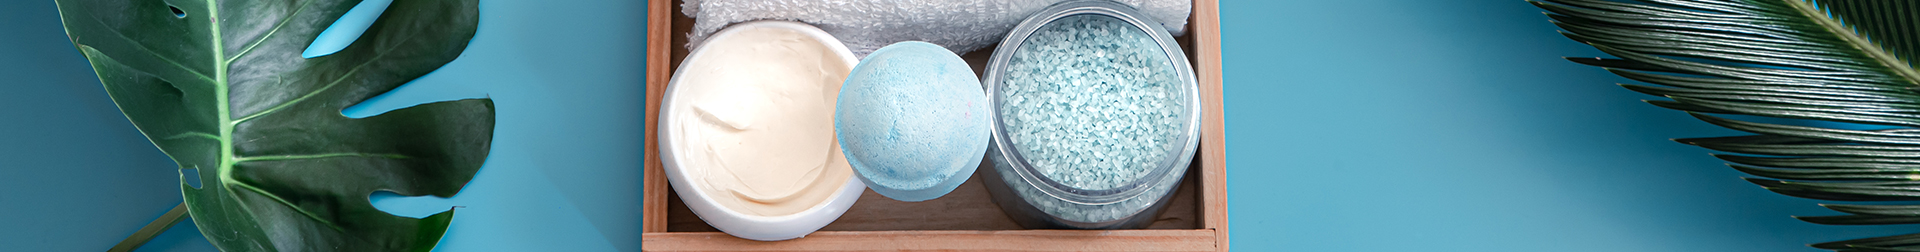 Body - Skin Care Products - Buy Best Body Powder - Top Brands | AromaCraze